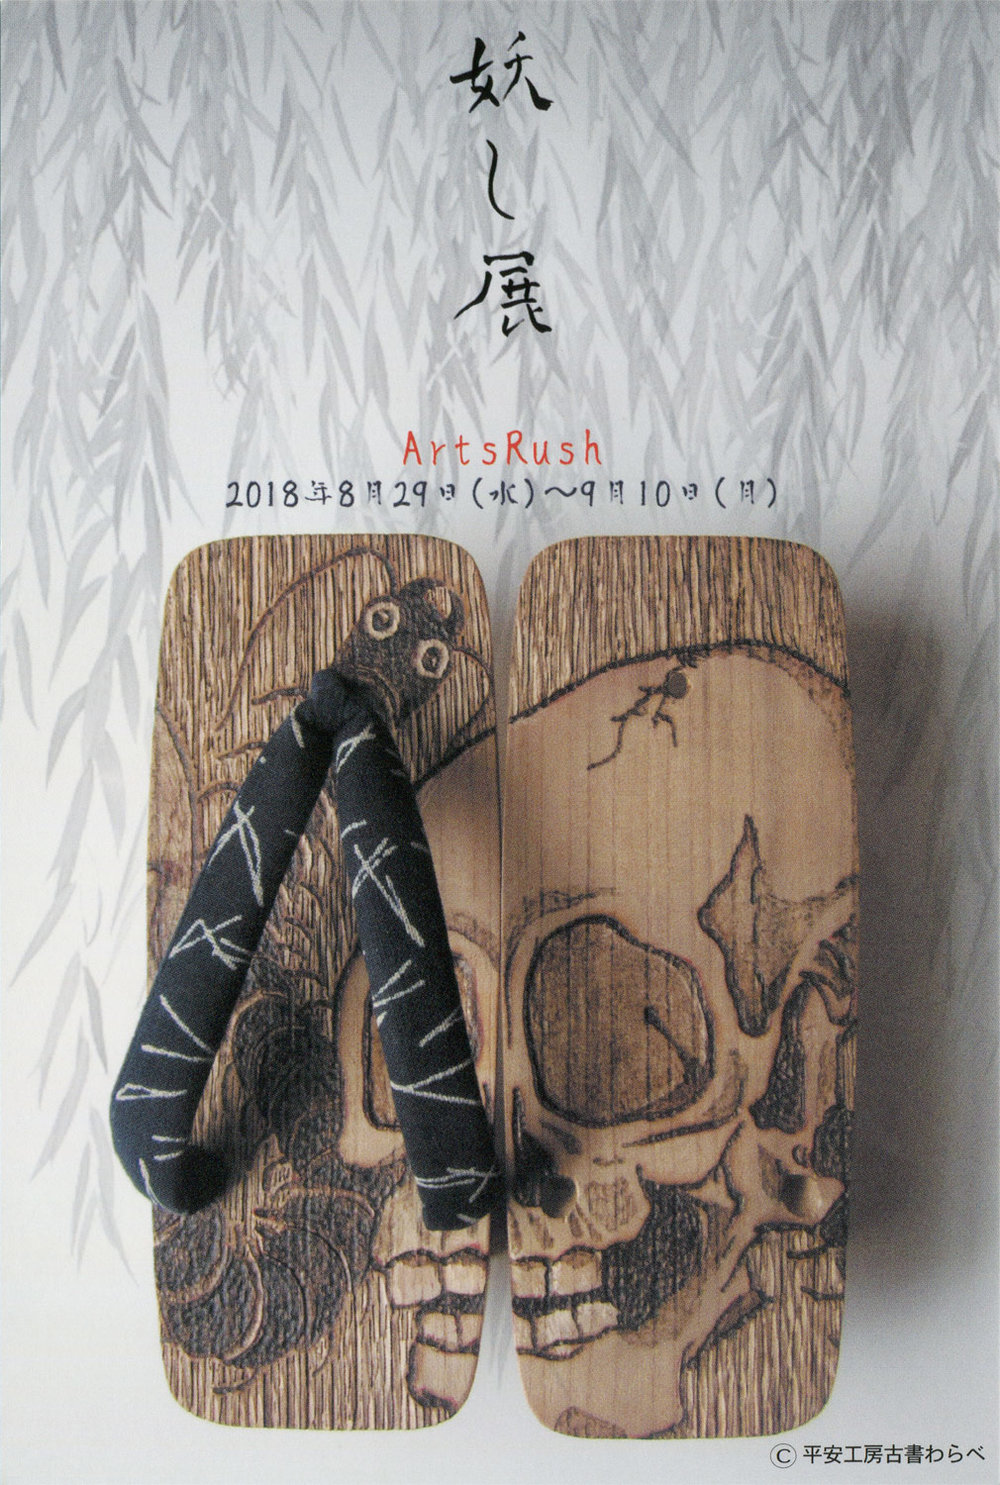 Ayashi •妖し展 - Aug. 29 - Sept. 10, 2018 @ Arts Rush Gallery, Tokyo